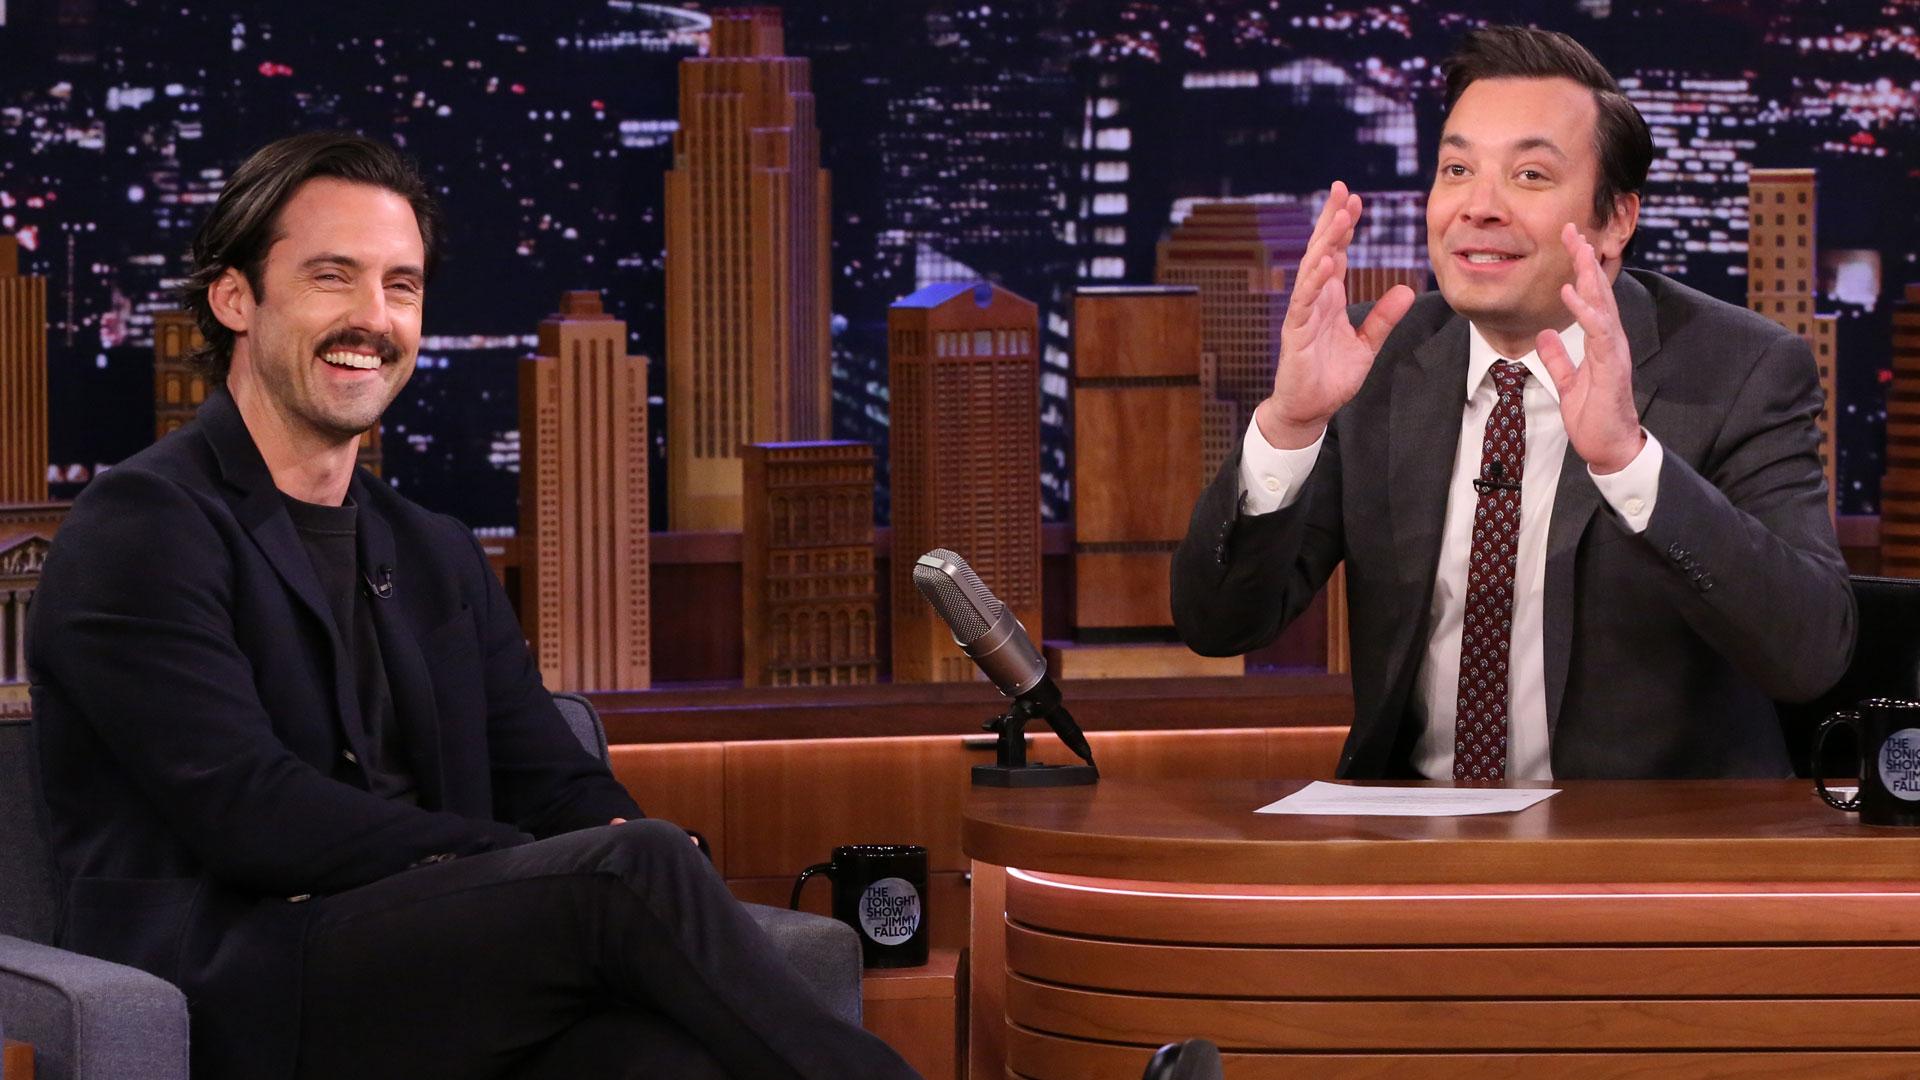 Watch The Tonight Show Starring Jimmy Fallon Episode: Milo